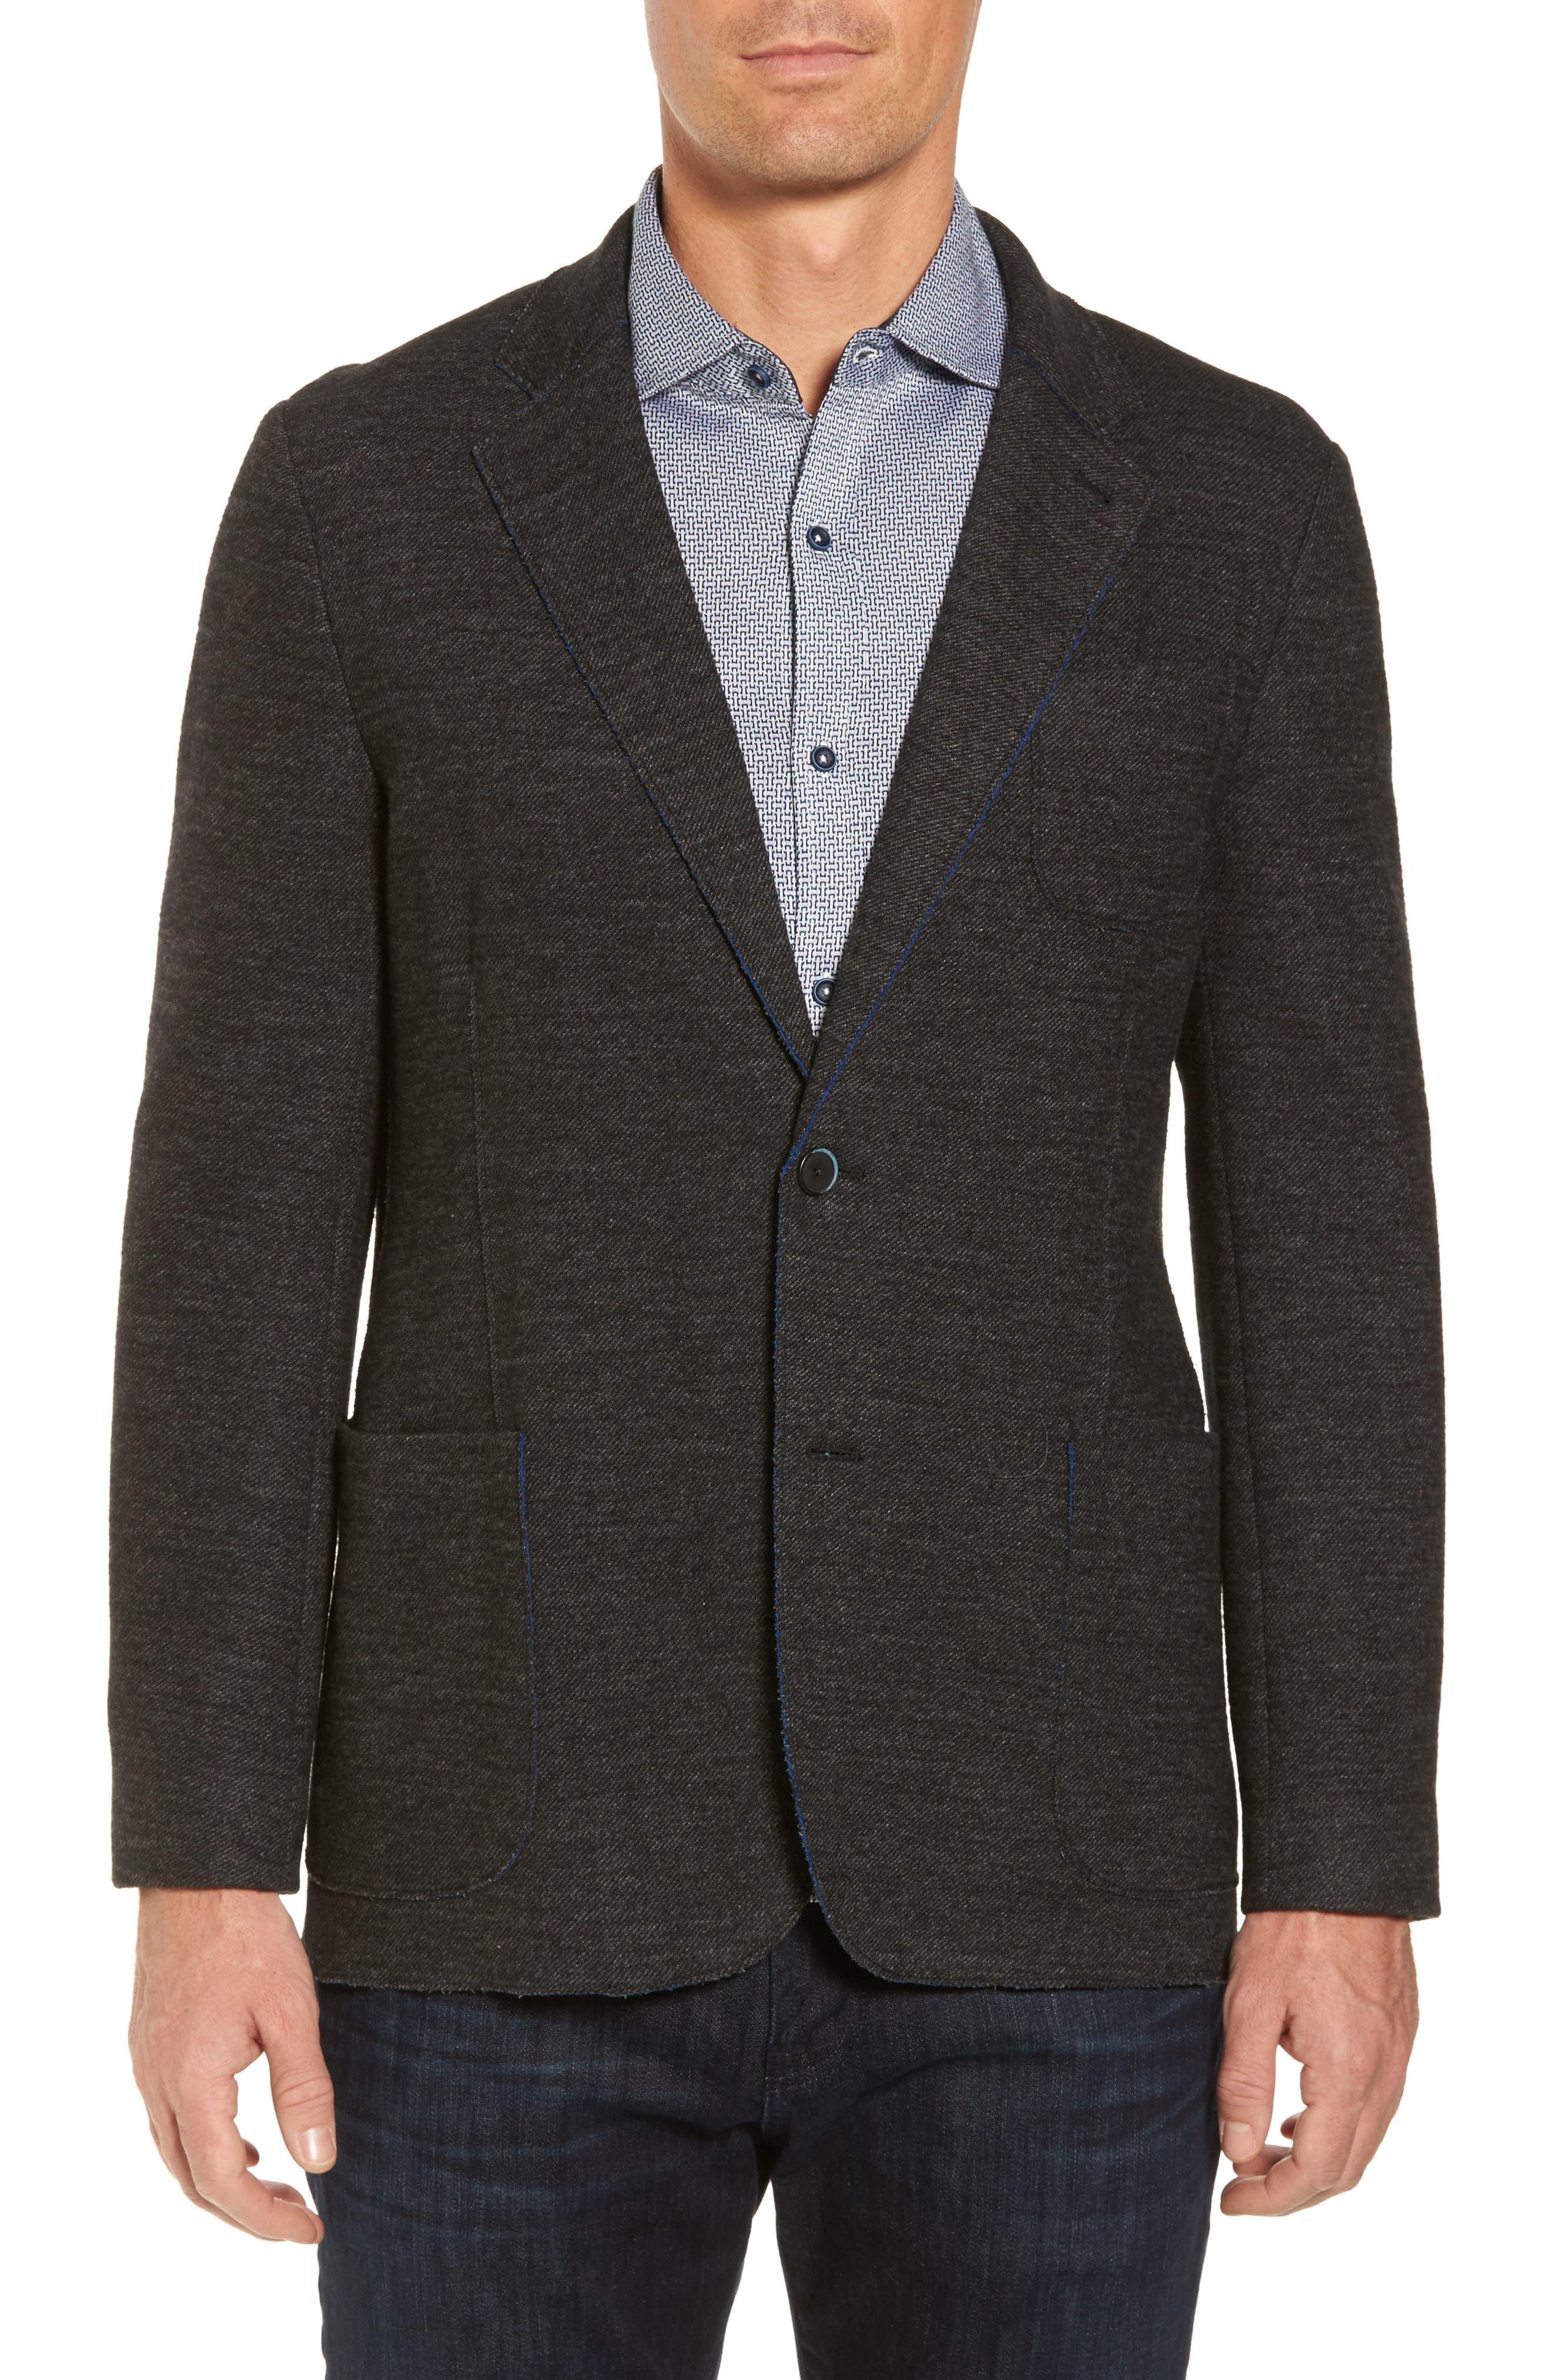 Alternate Image 1 Selected - Bugatchi Raw Edge Cotton Blend Blazer